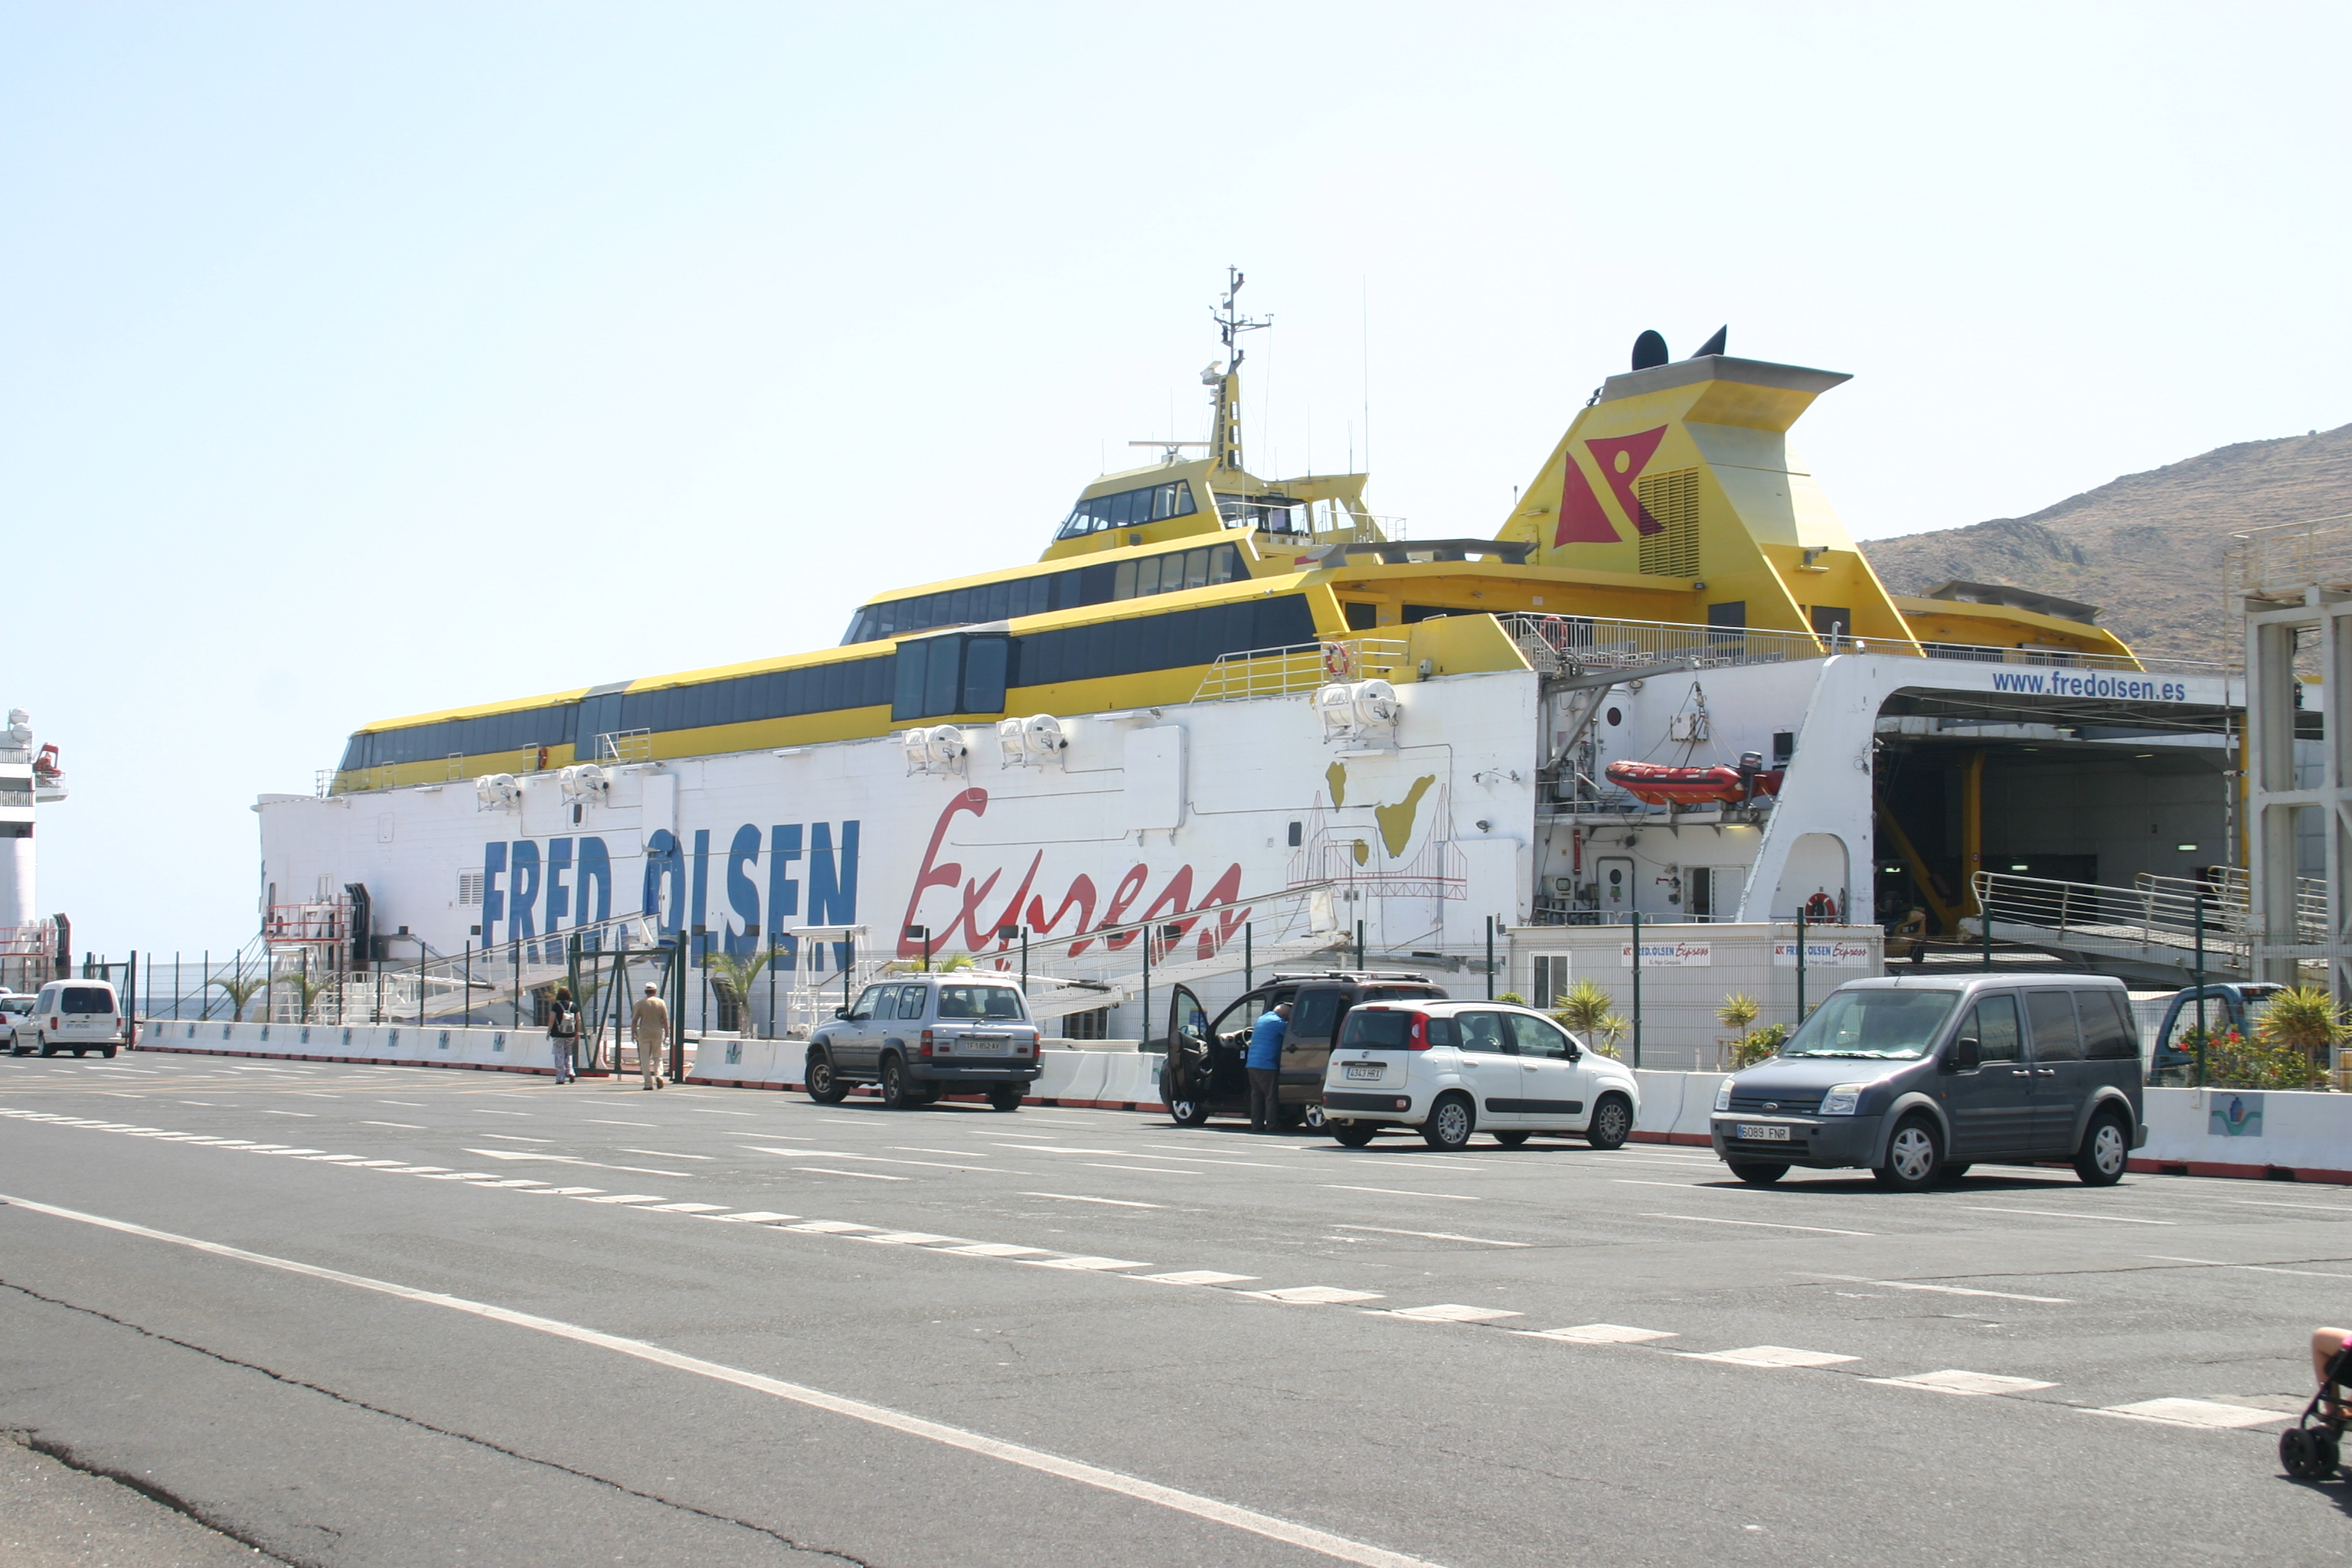 Fred. Olsen Express Ferry